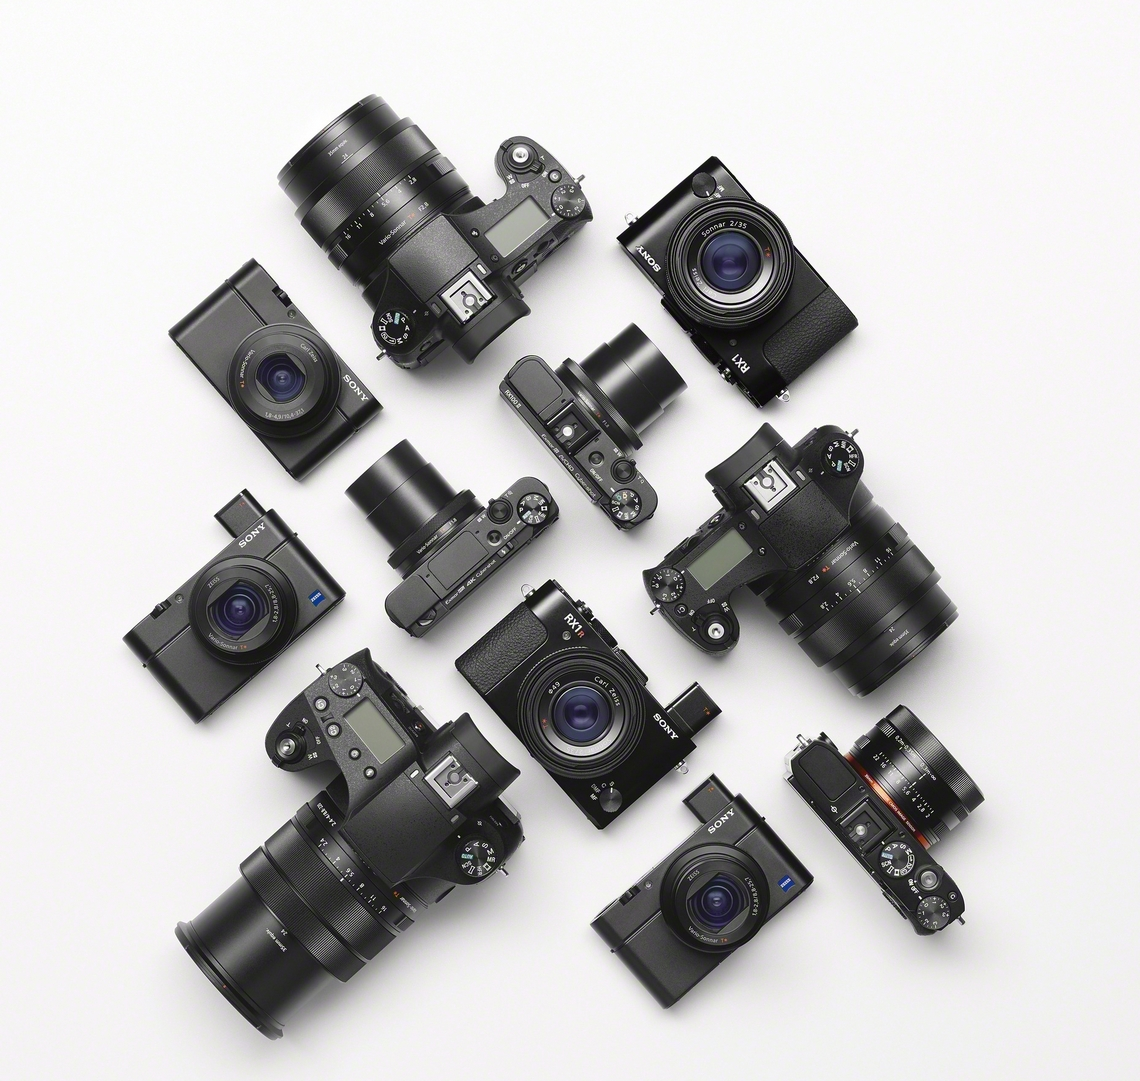 Kompakty serii Sony RX, jak kupić aparat fotograficzny